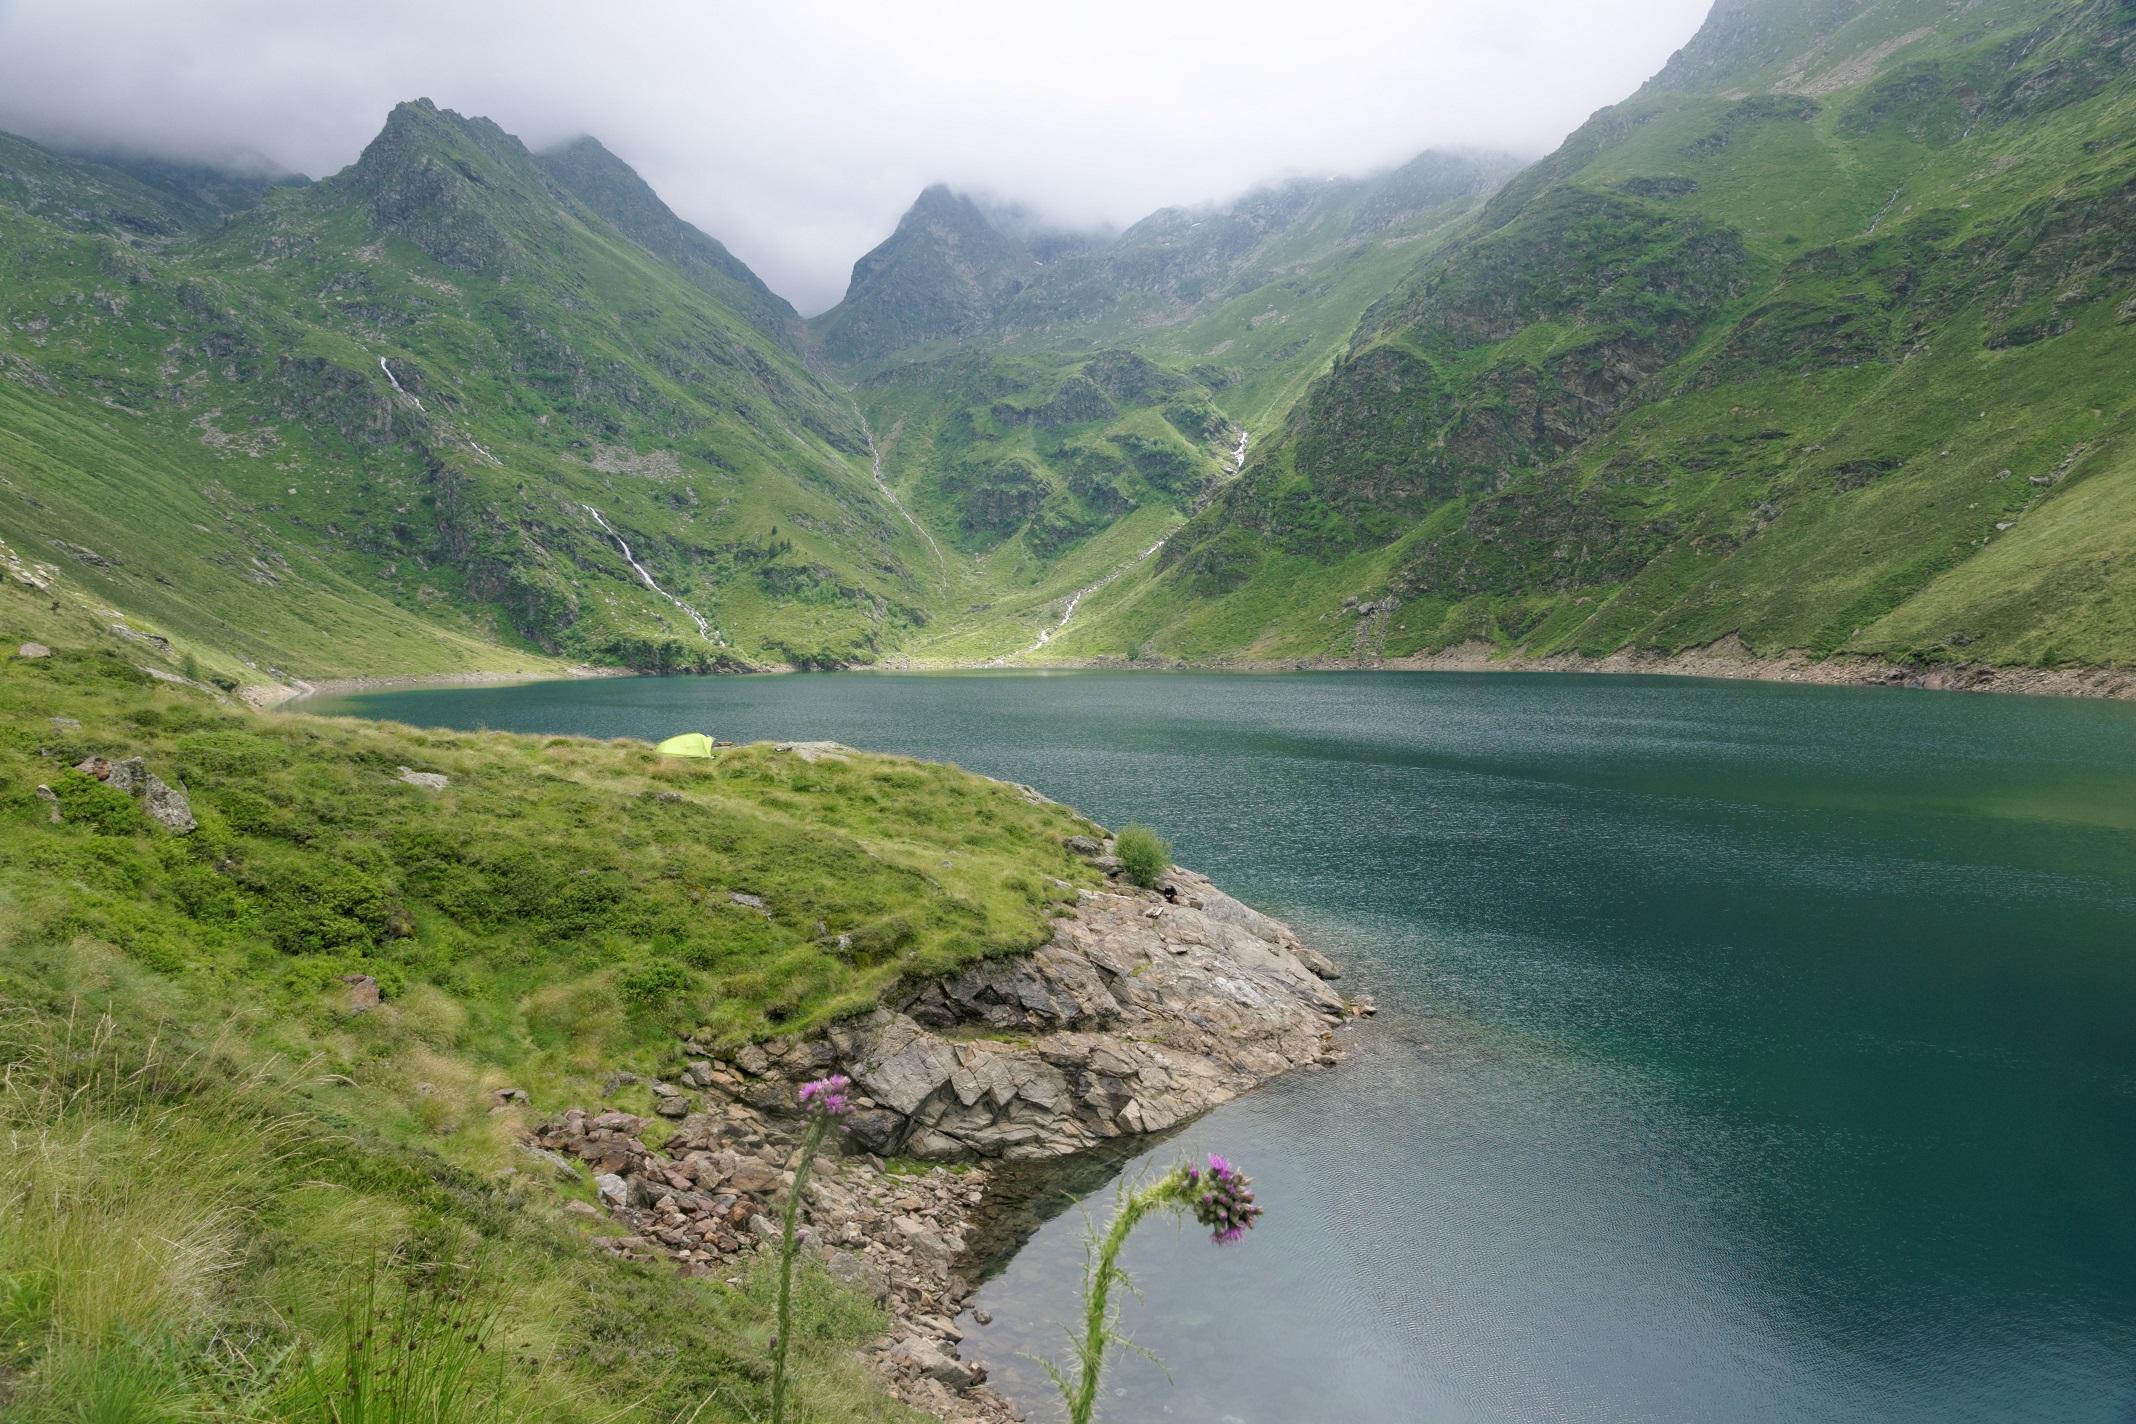 L'étang d'Izourt